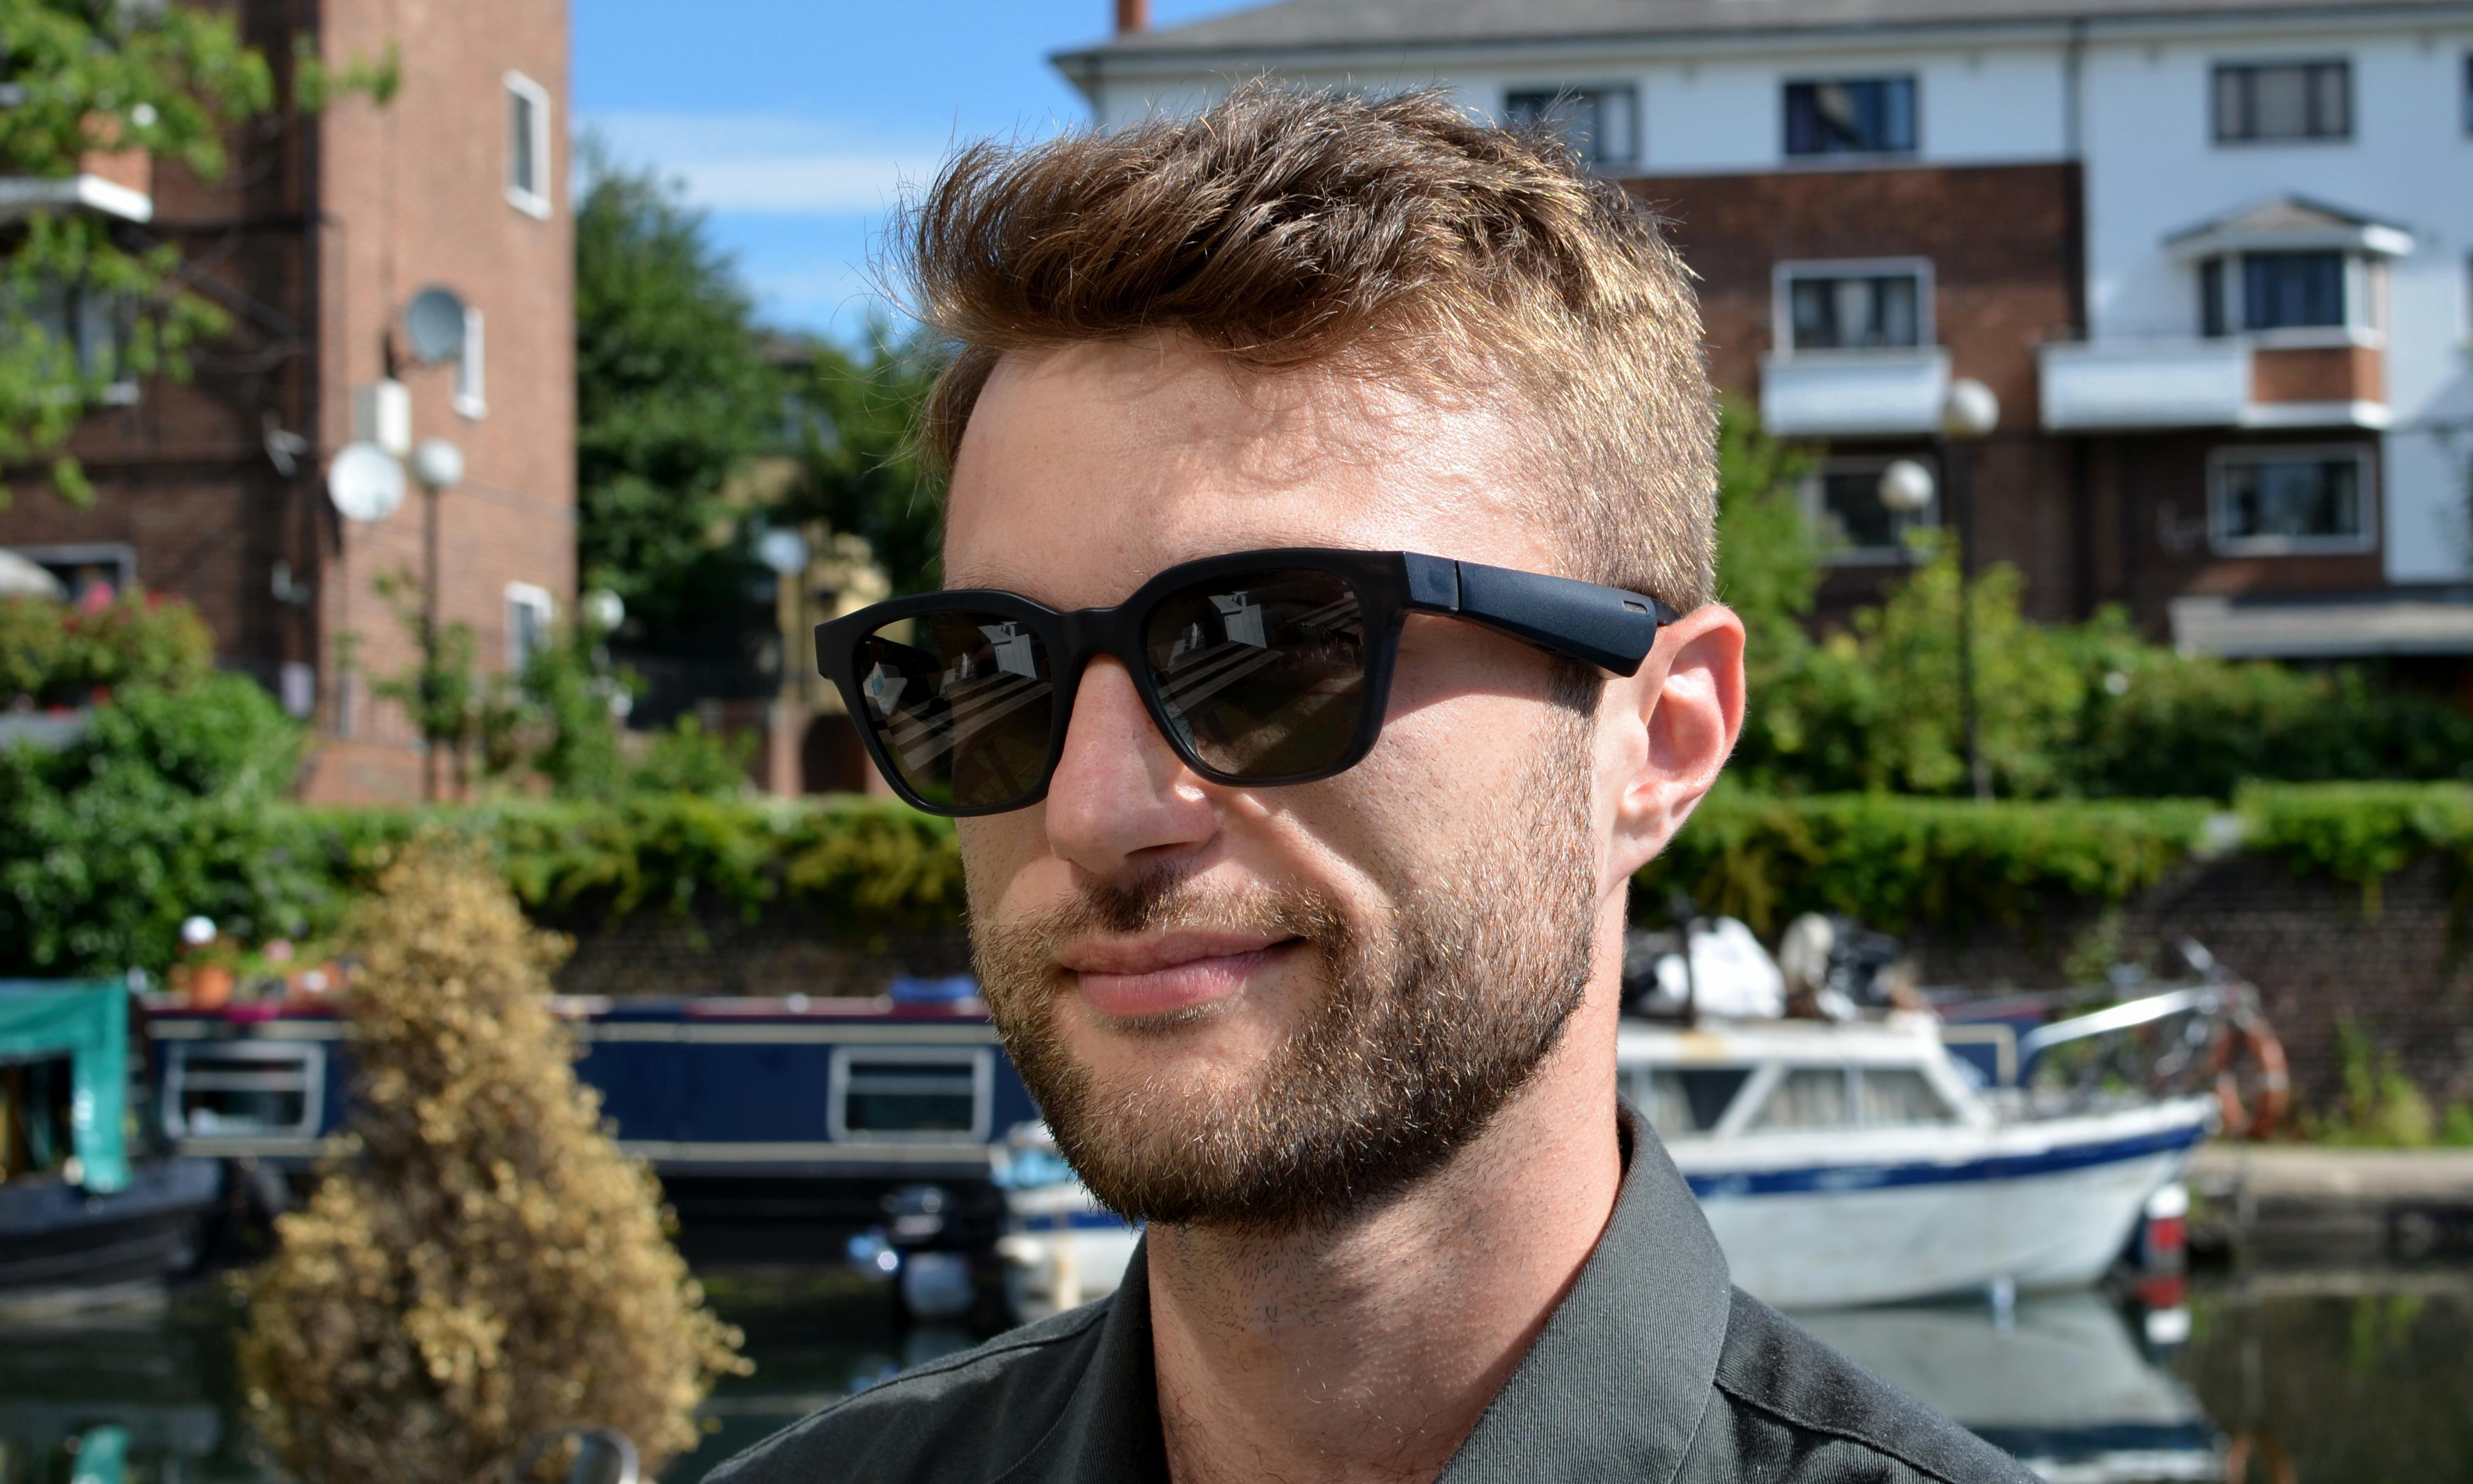 Bose Frames review: smart audio sunglasses are a blast